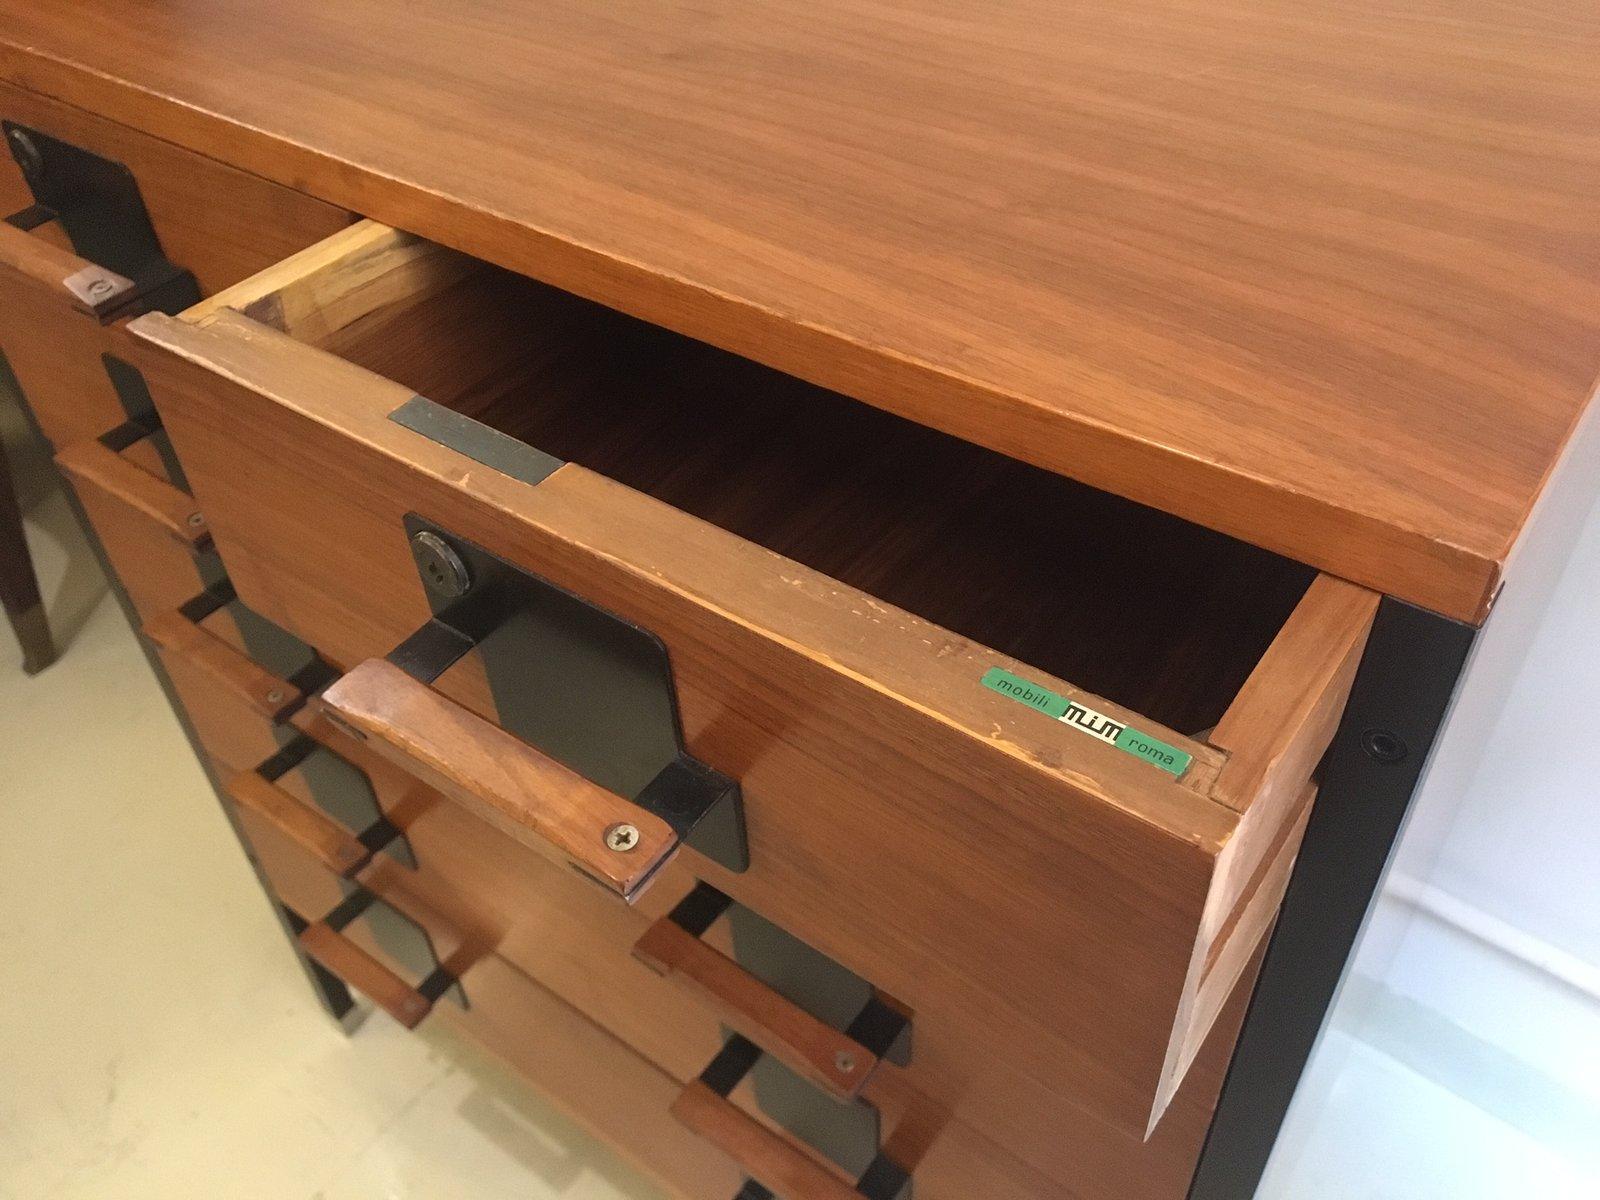 Positano chest by ico luisa parisi for mobili italiani for Mobili italiani design